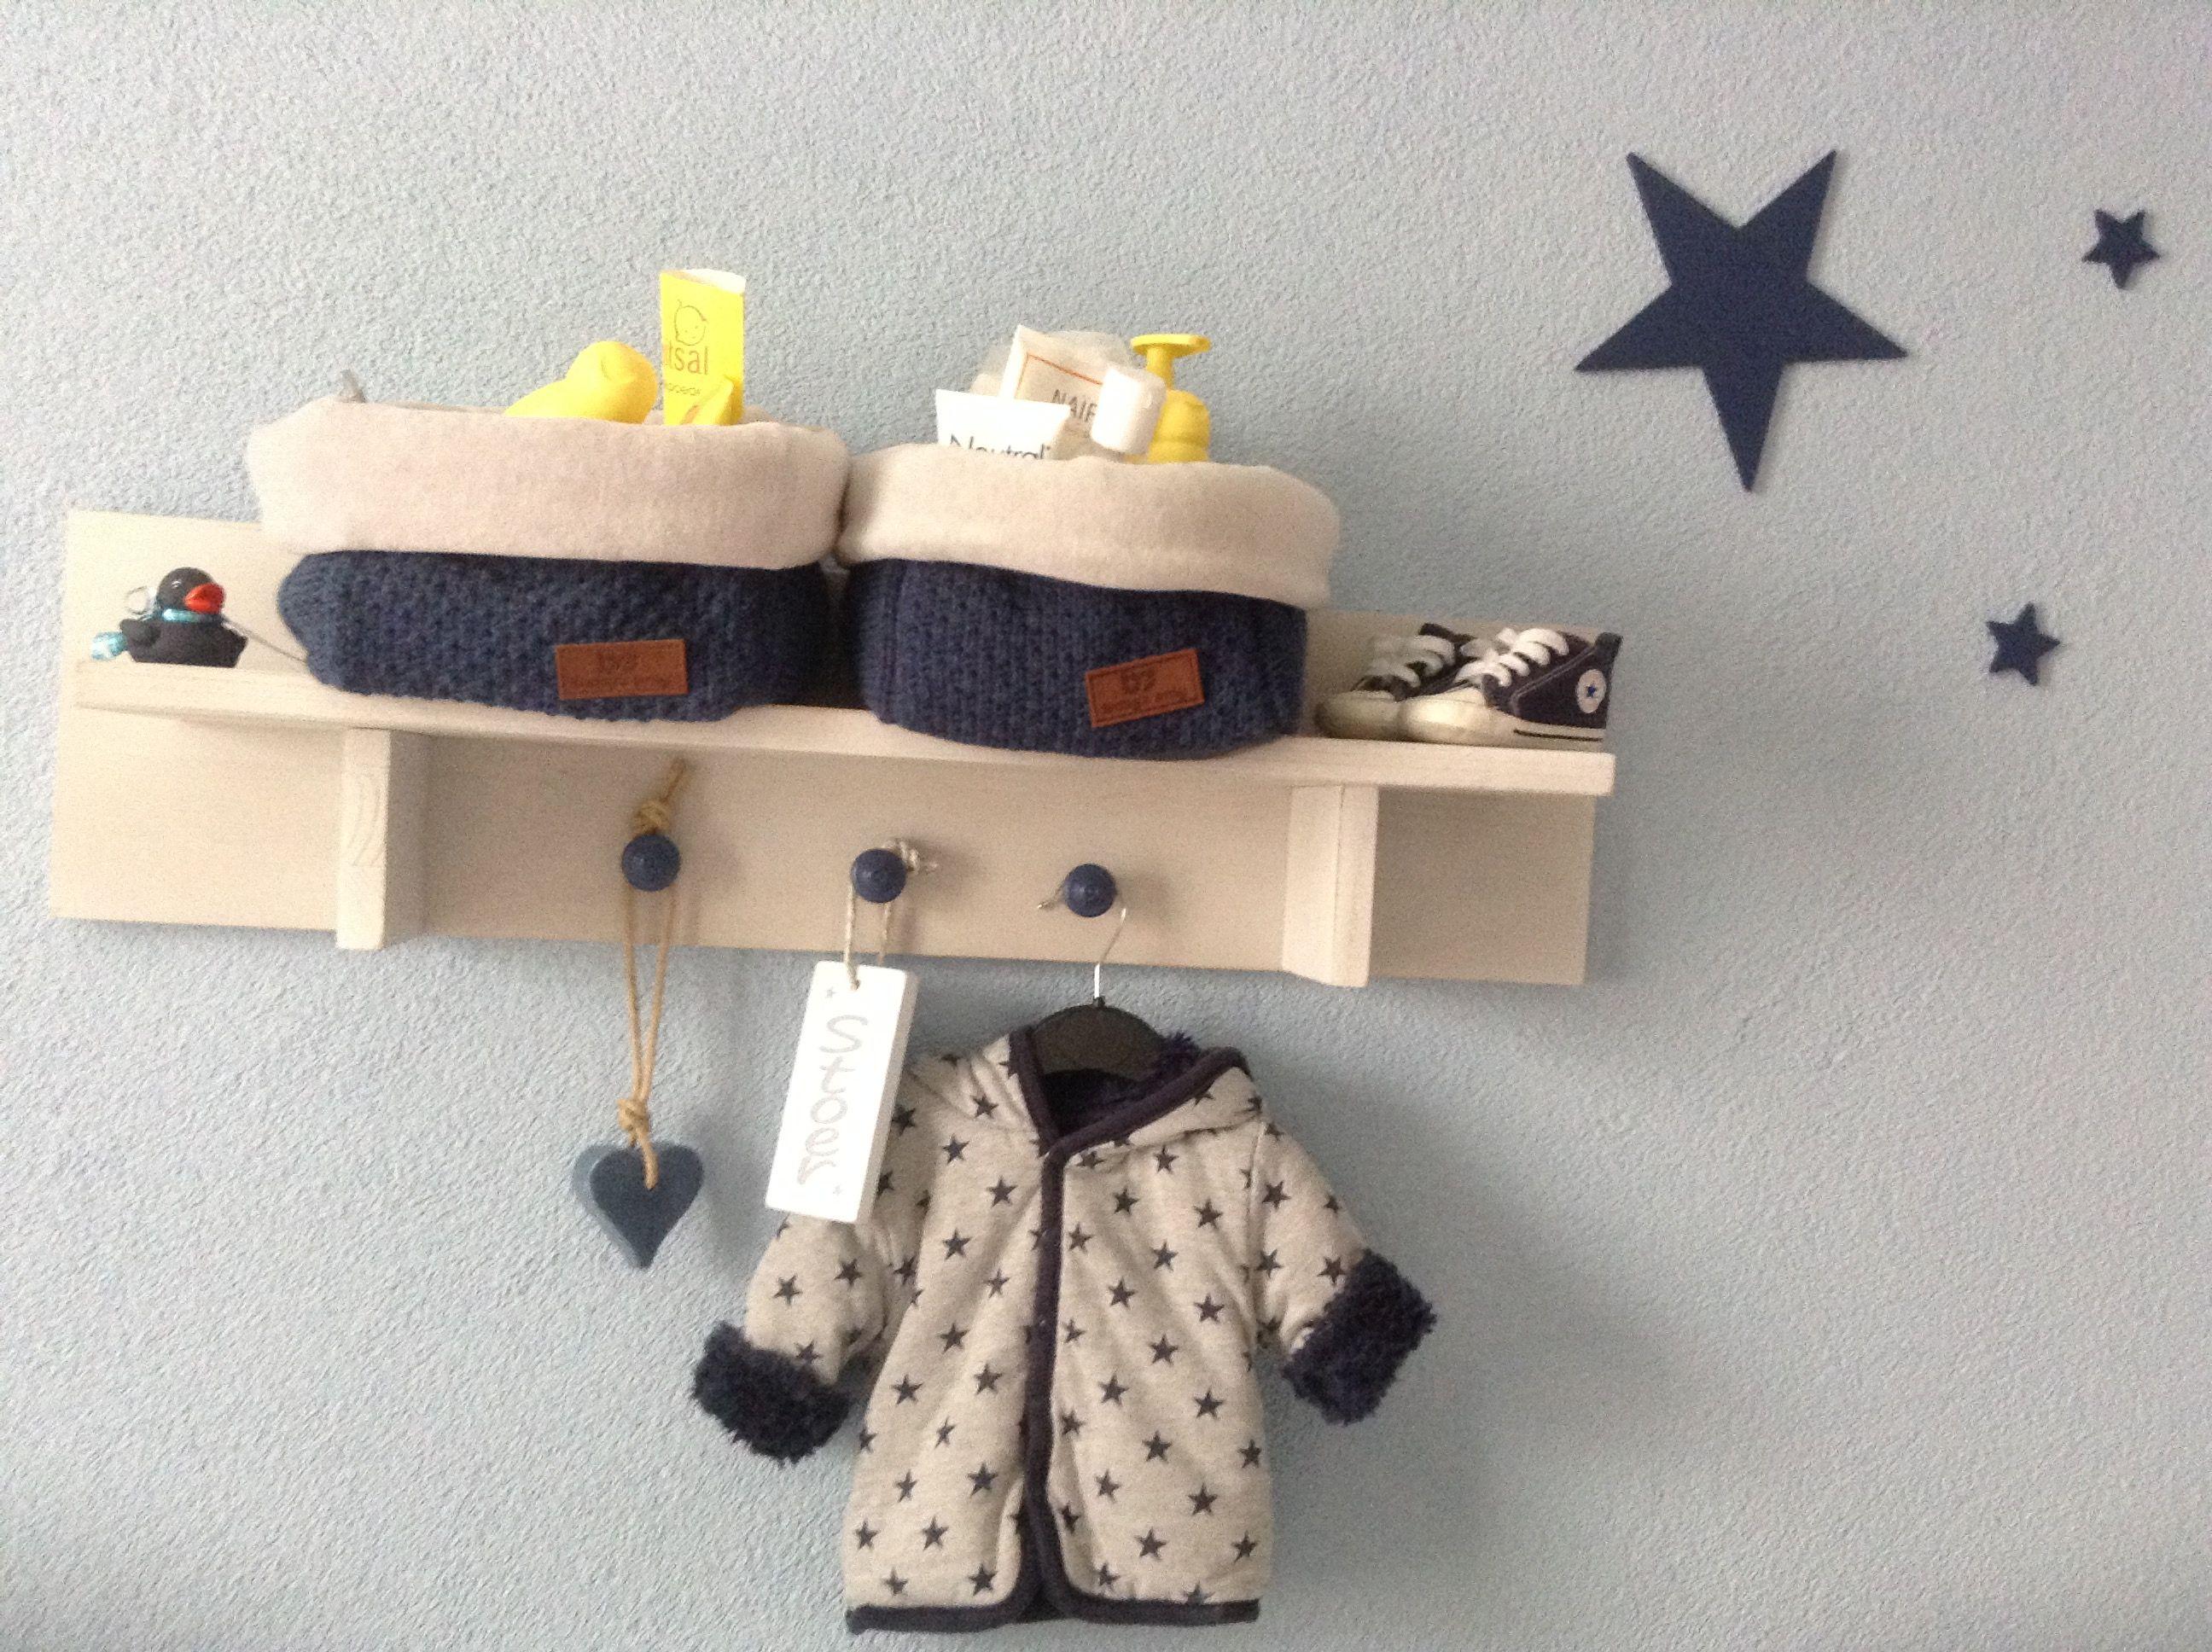 Babykamer  Wandplank van bopita Tim blue wash (knopjes zelf erop gemaakt) Mandjes baby's only jeans  Sterren